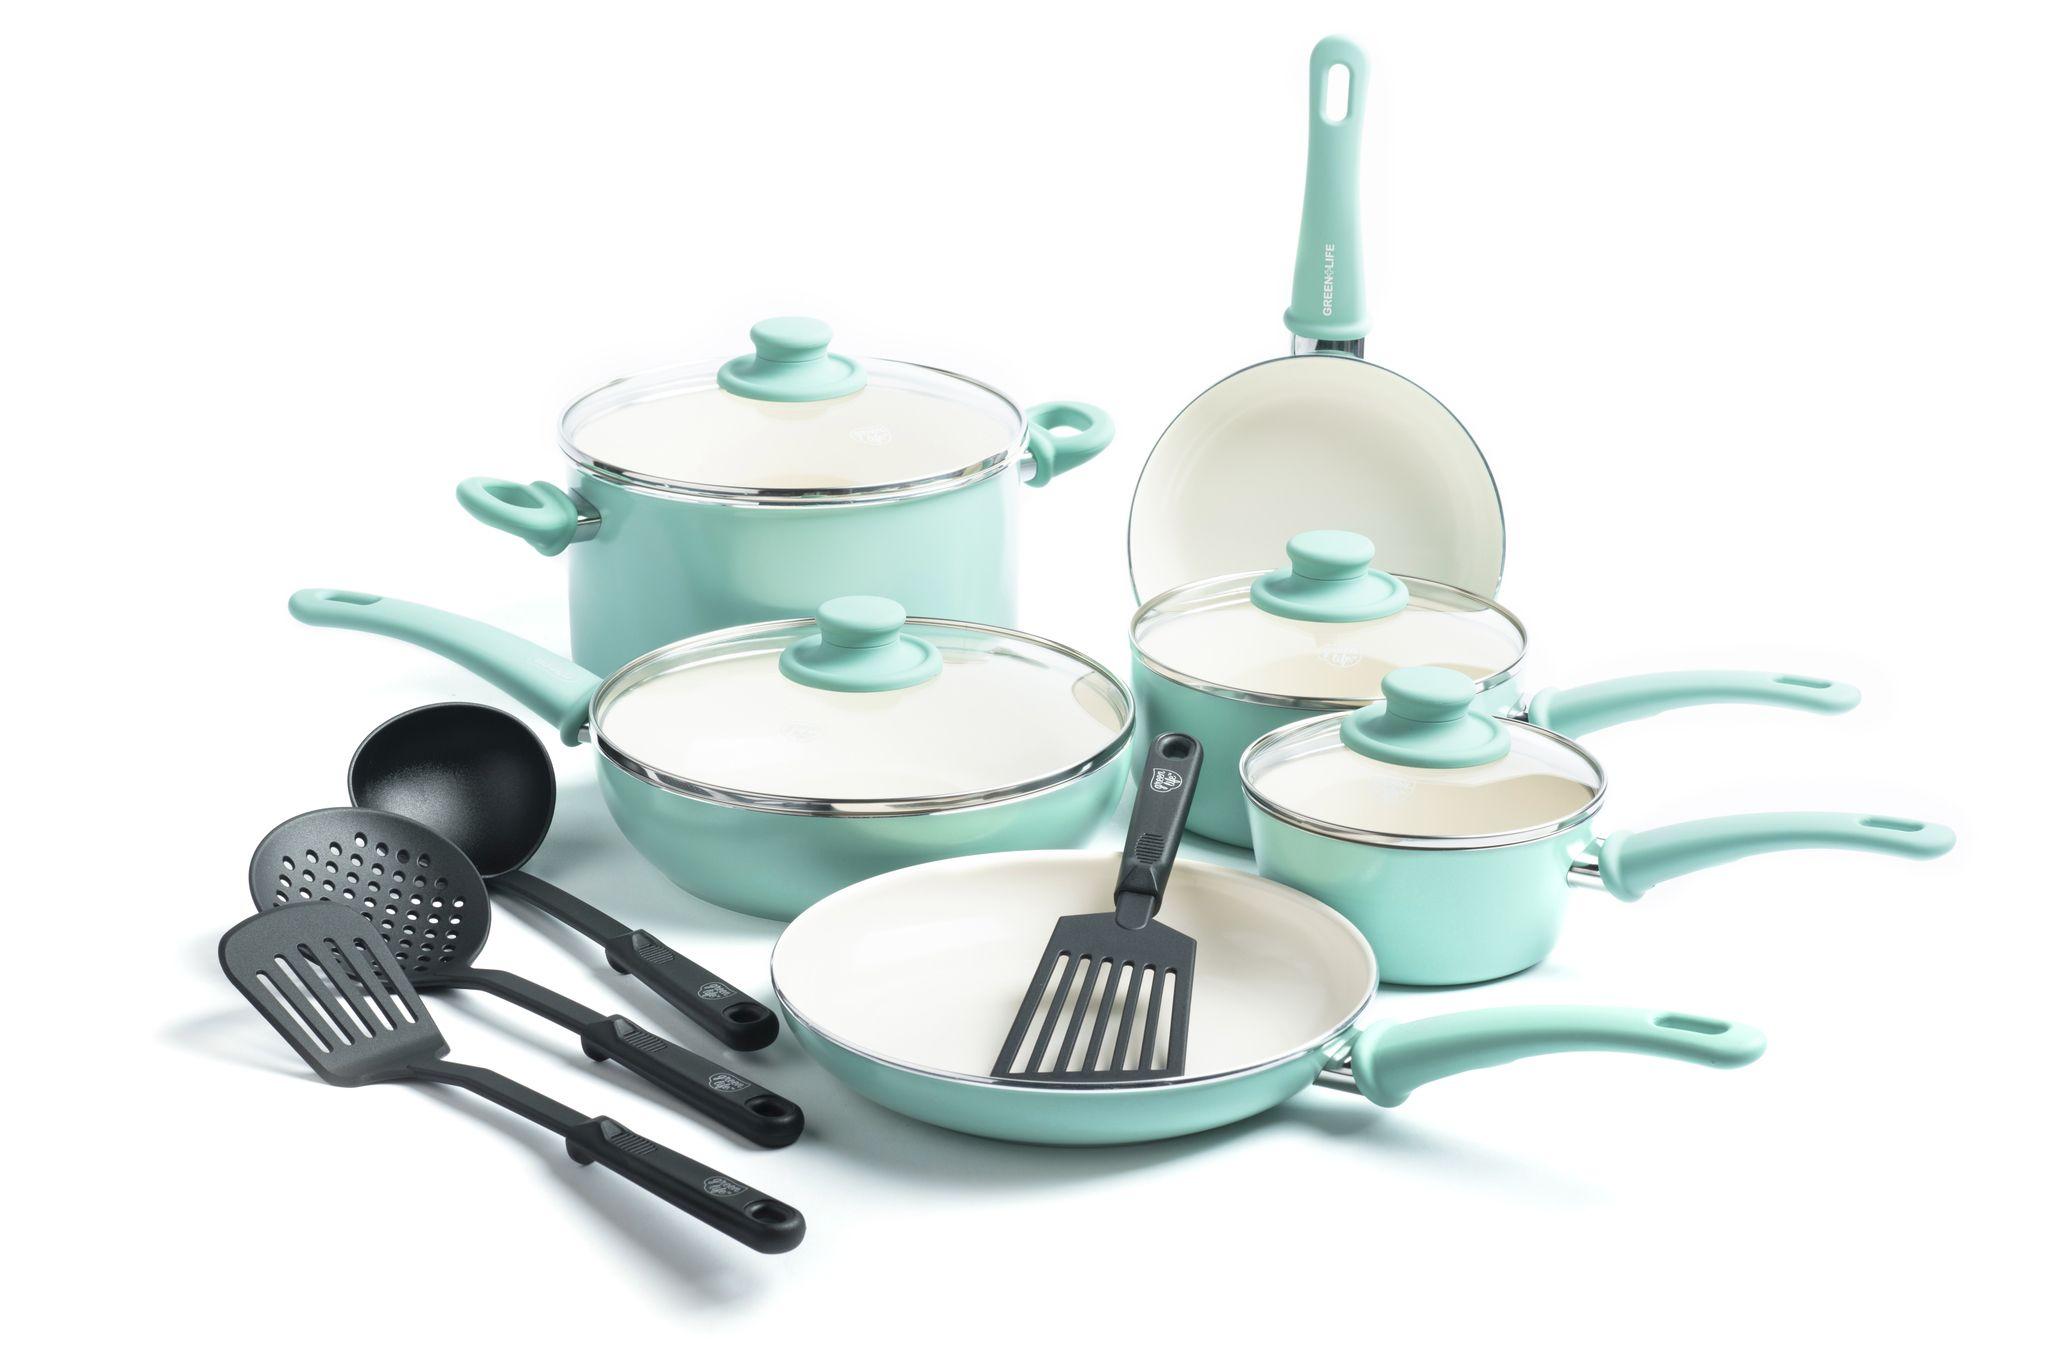 Greenlife ceramic nonstick 14 piece cookware set